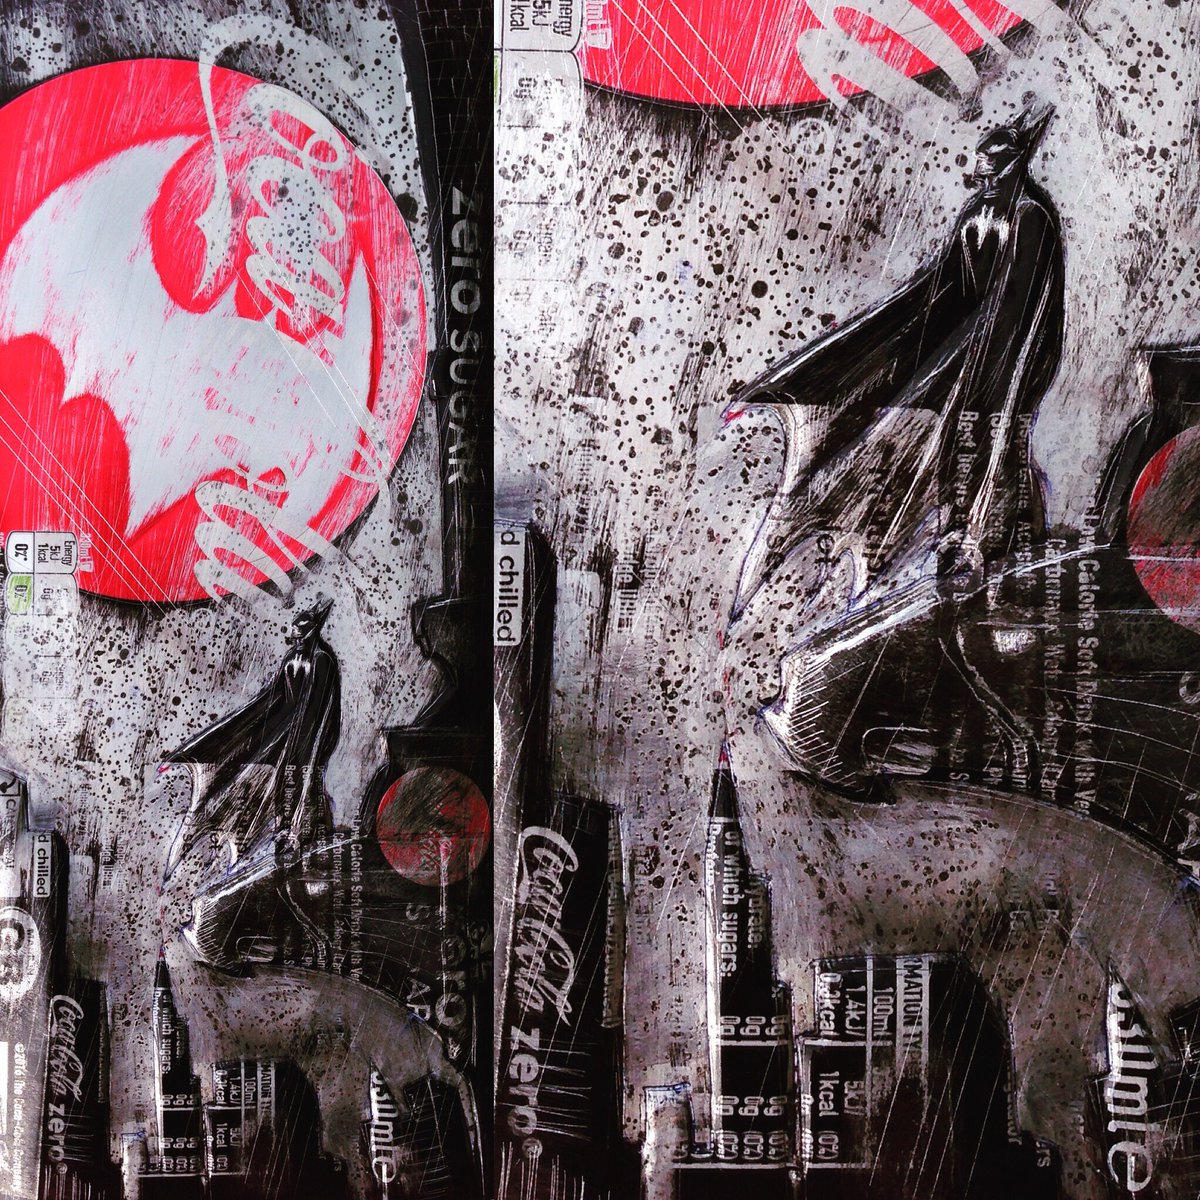 ComicCAN #cokezero by Chris Duncan F/RETWEET  Original &amp; prints available! #batman #coke #marvel #dc #comics #recycle  #streetart  #popart<br>http://pic.twitter.com/ys7oteUCxn